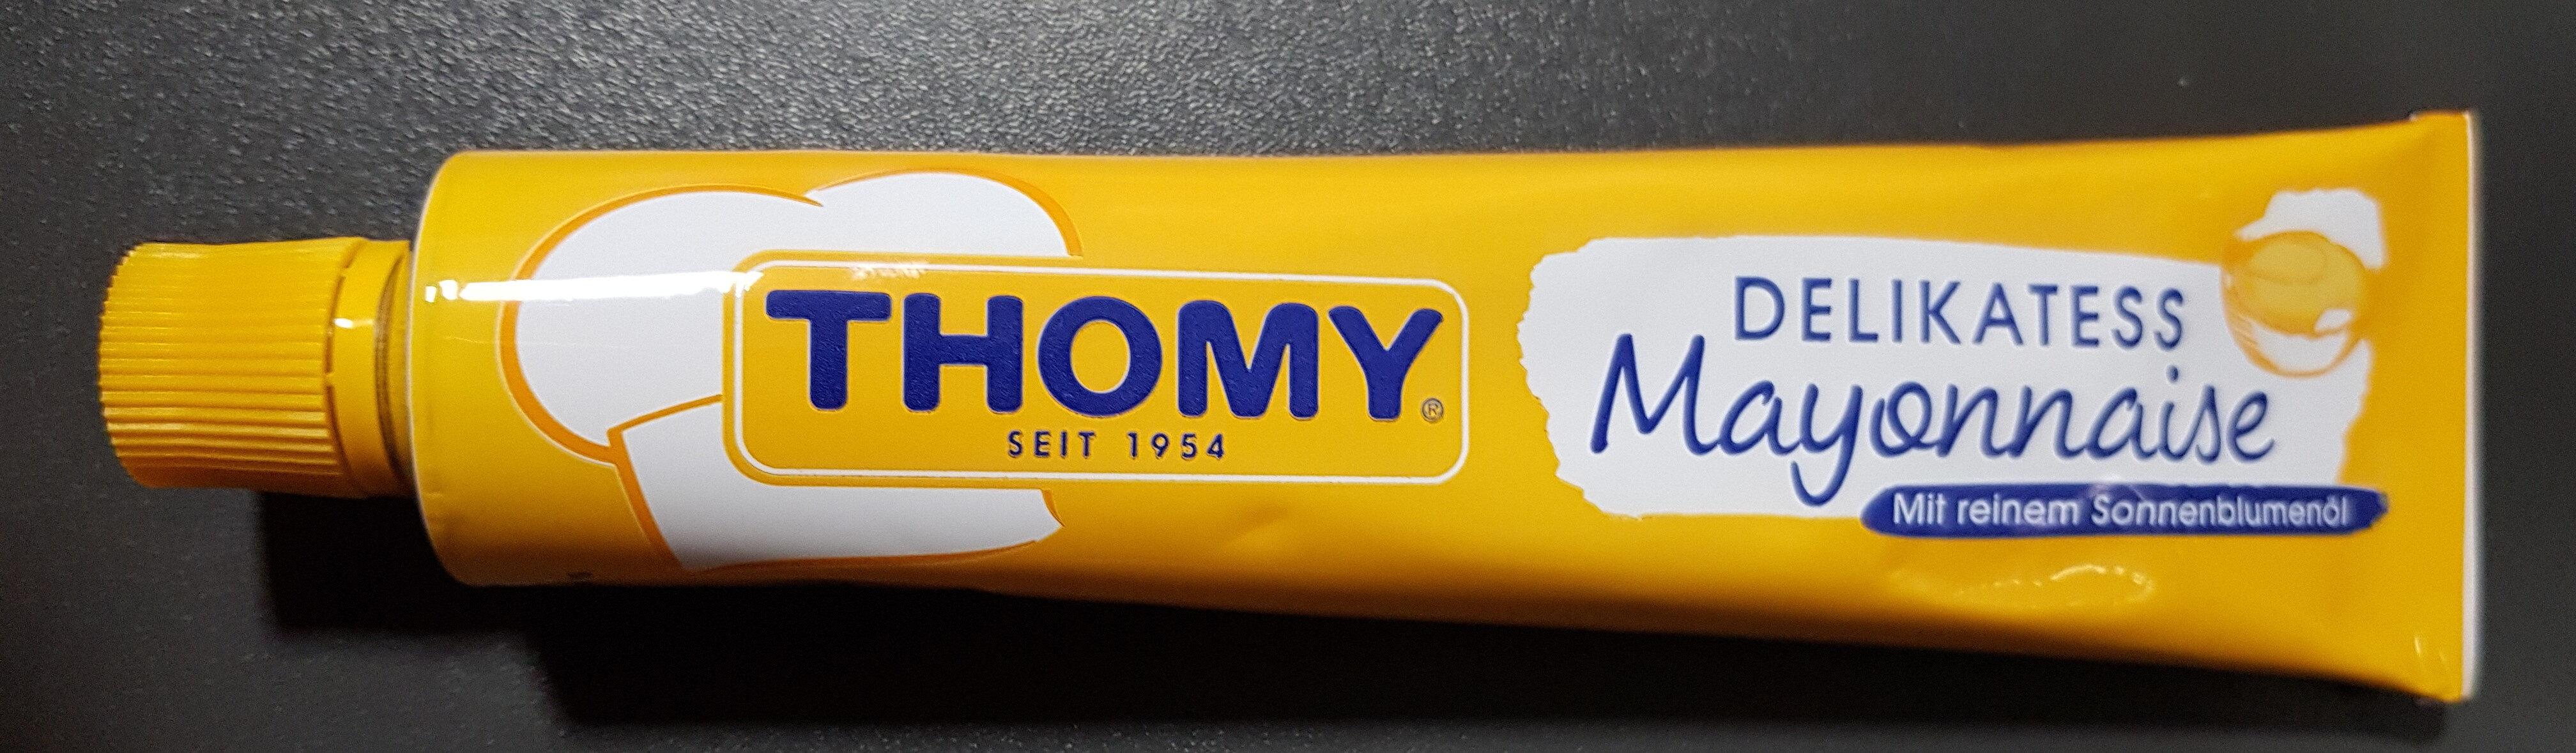 Delikatess Mayonnaise - Product - de